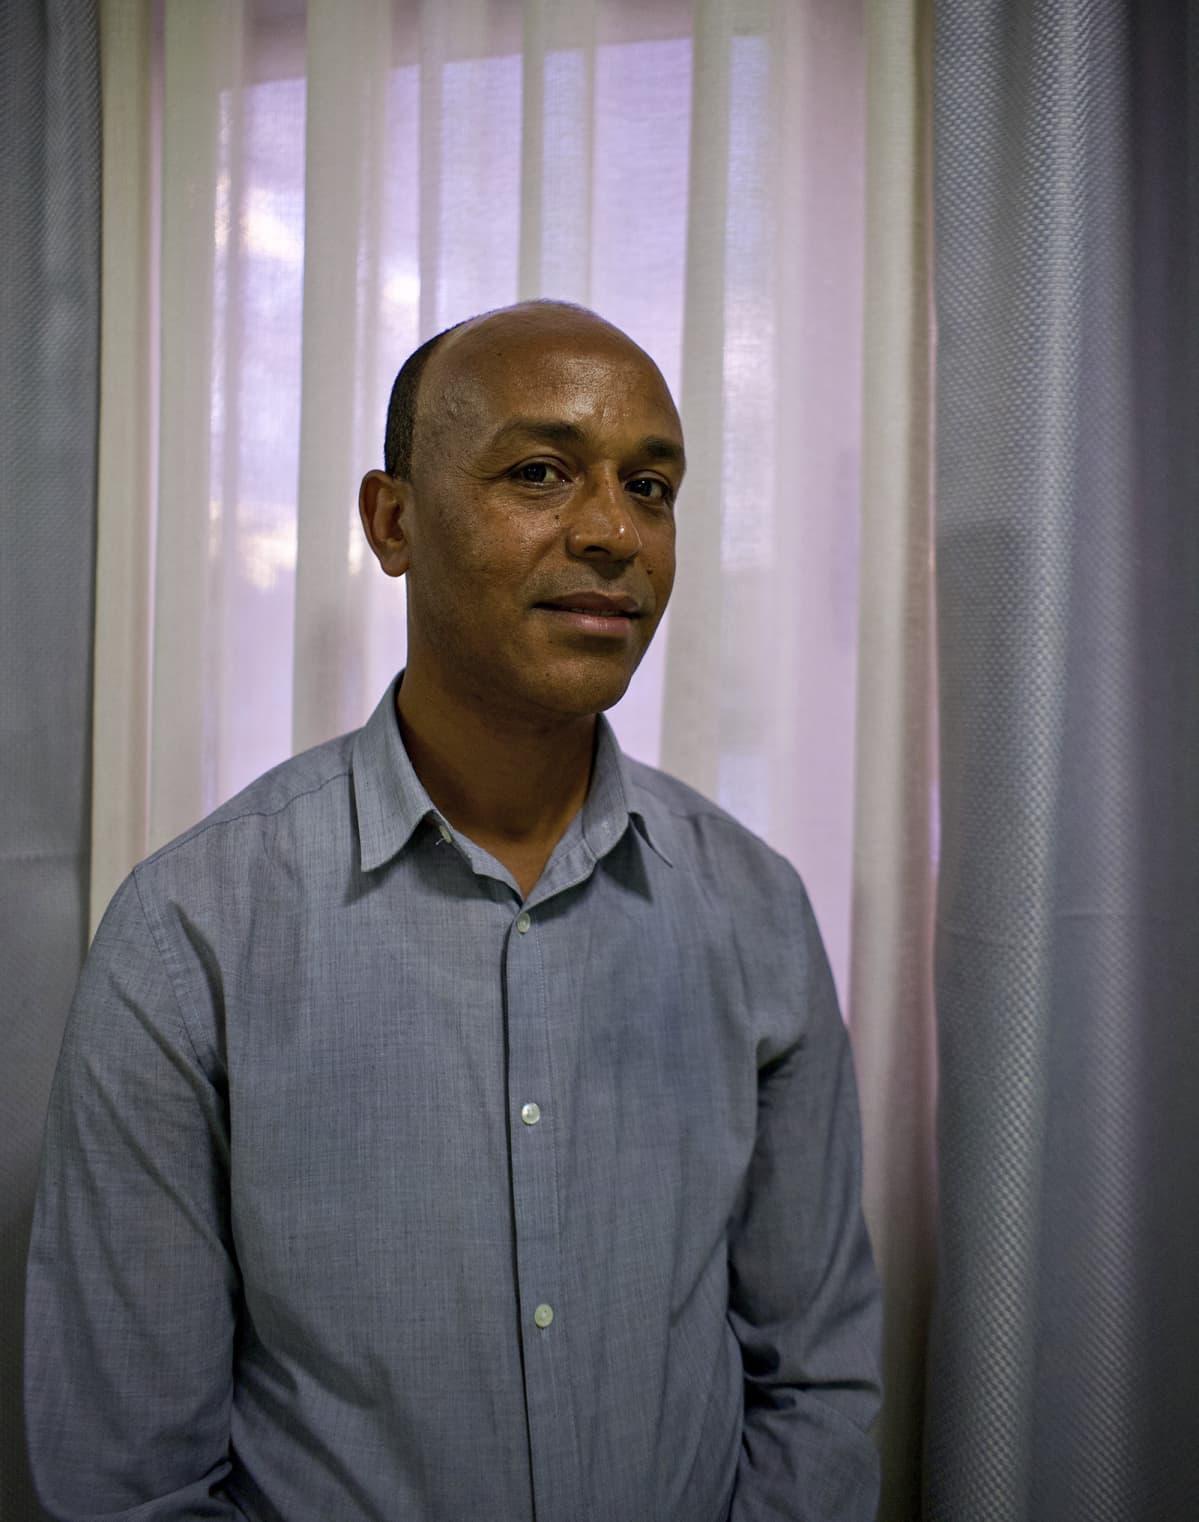 Kassahun Tesfaye